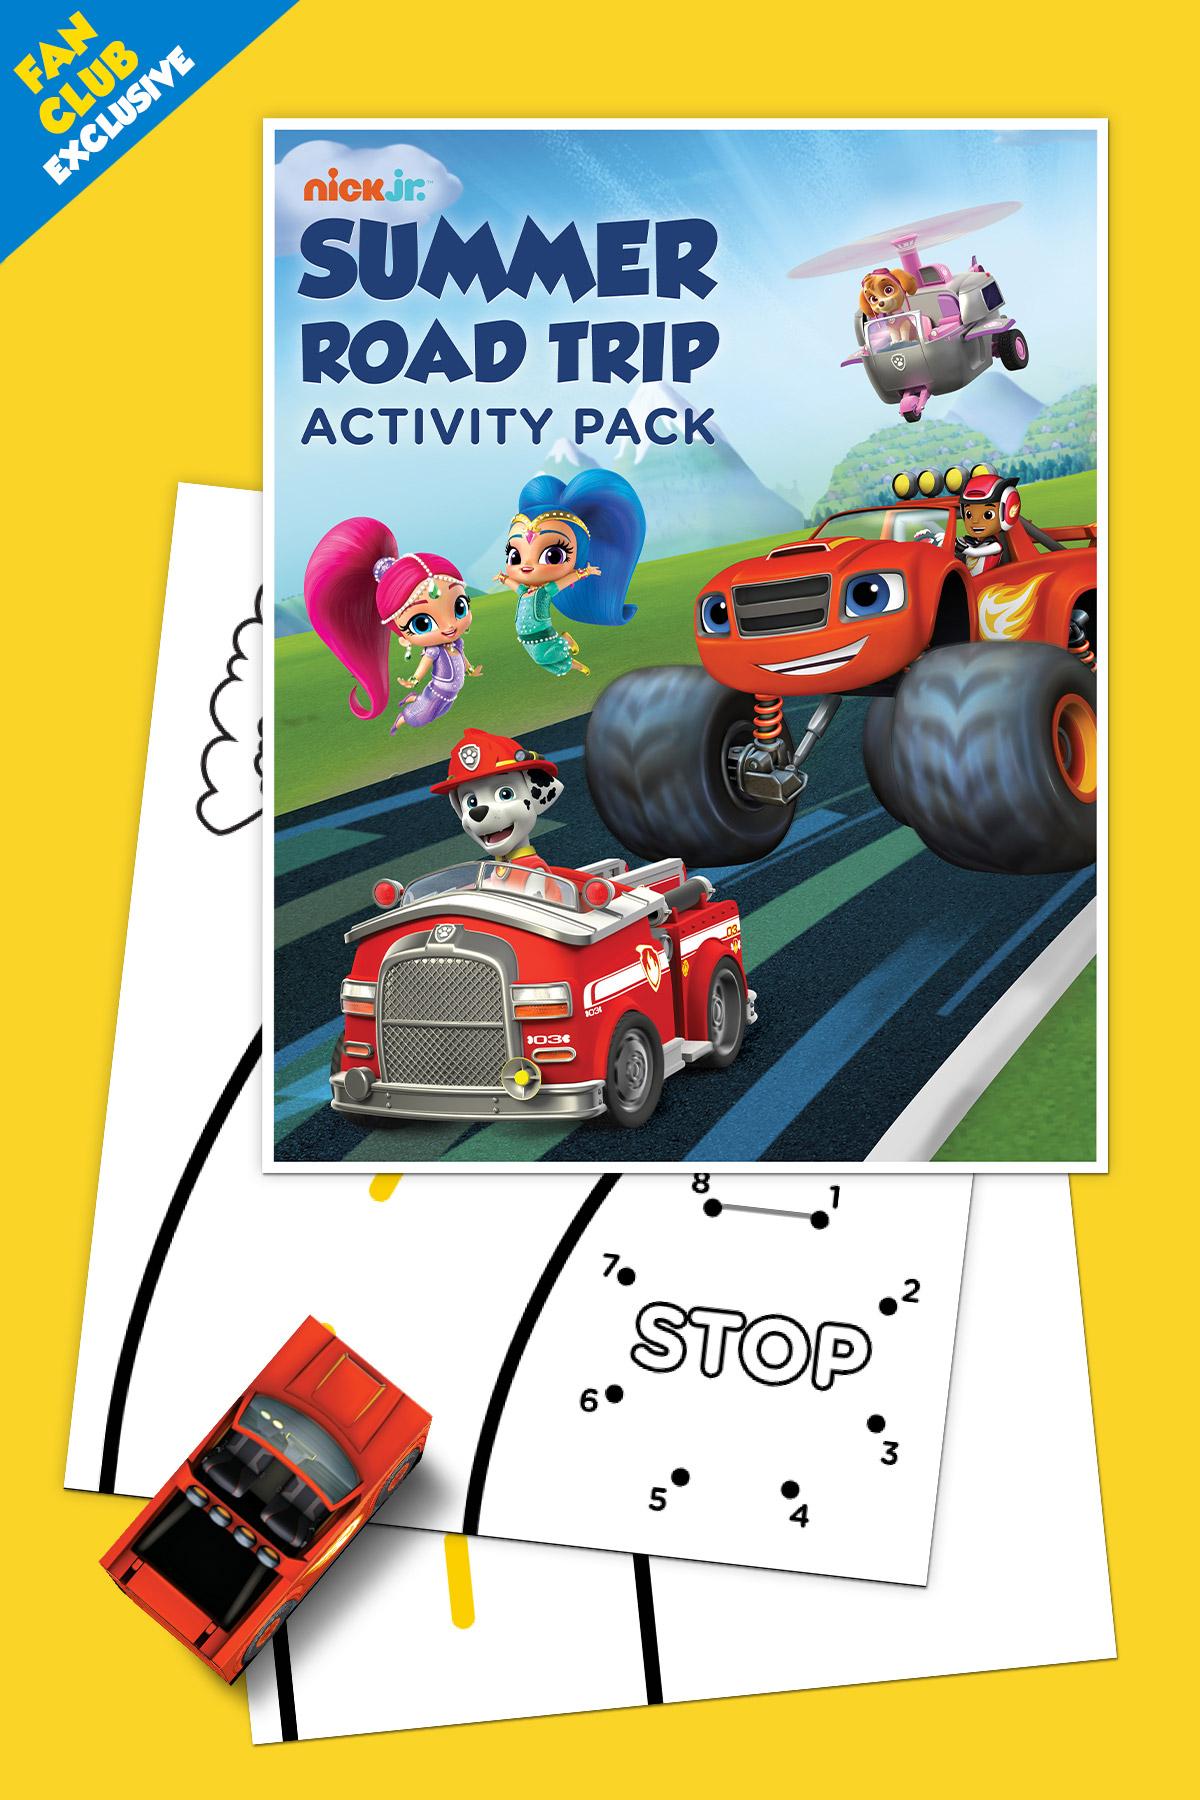 Fan Club Exclusive: Summer Road Trip Printable